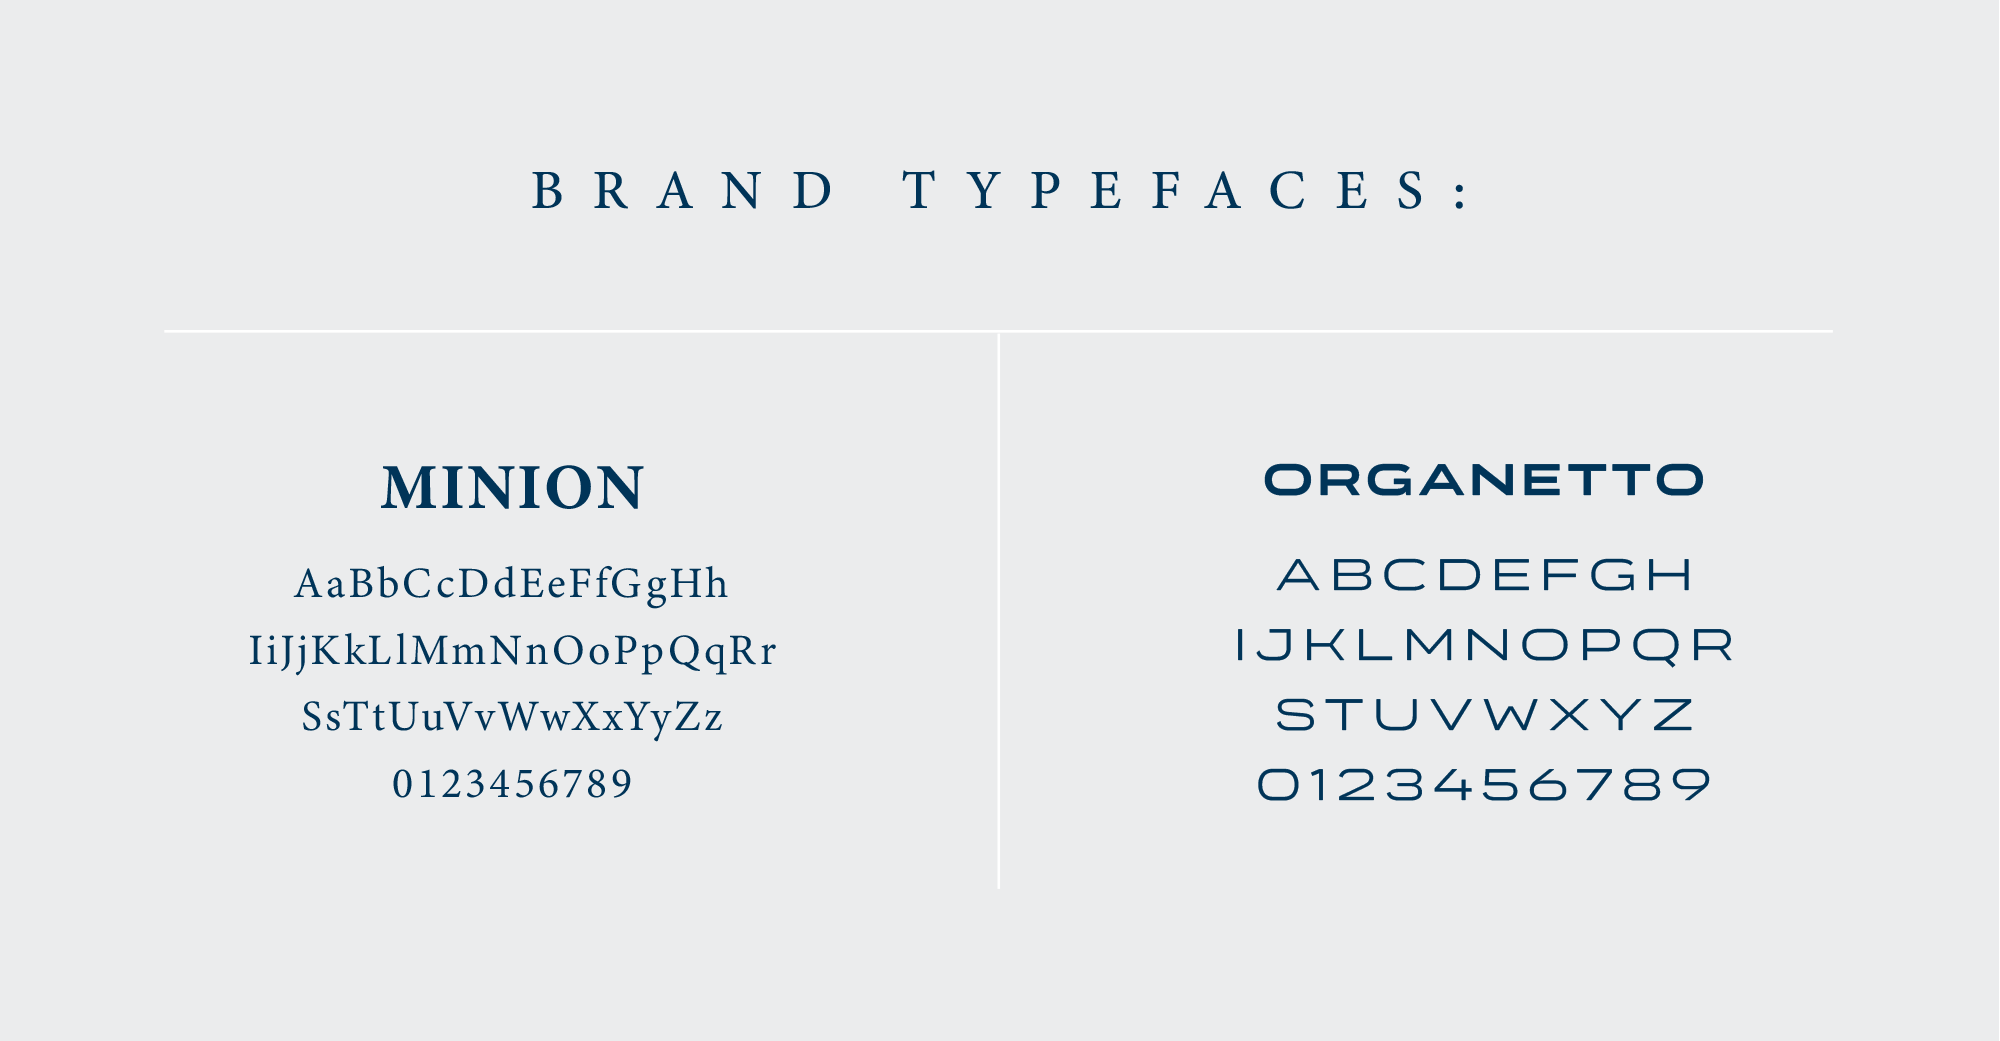 goat brand typefaces